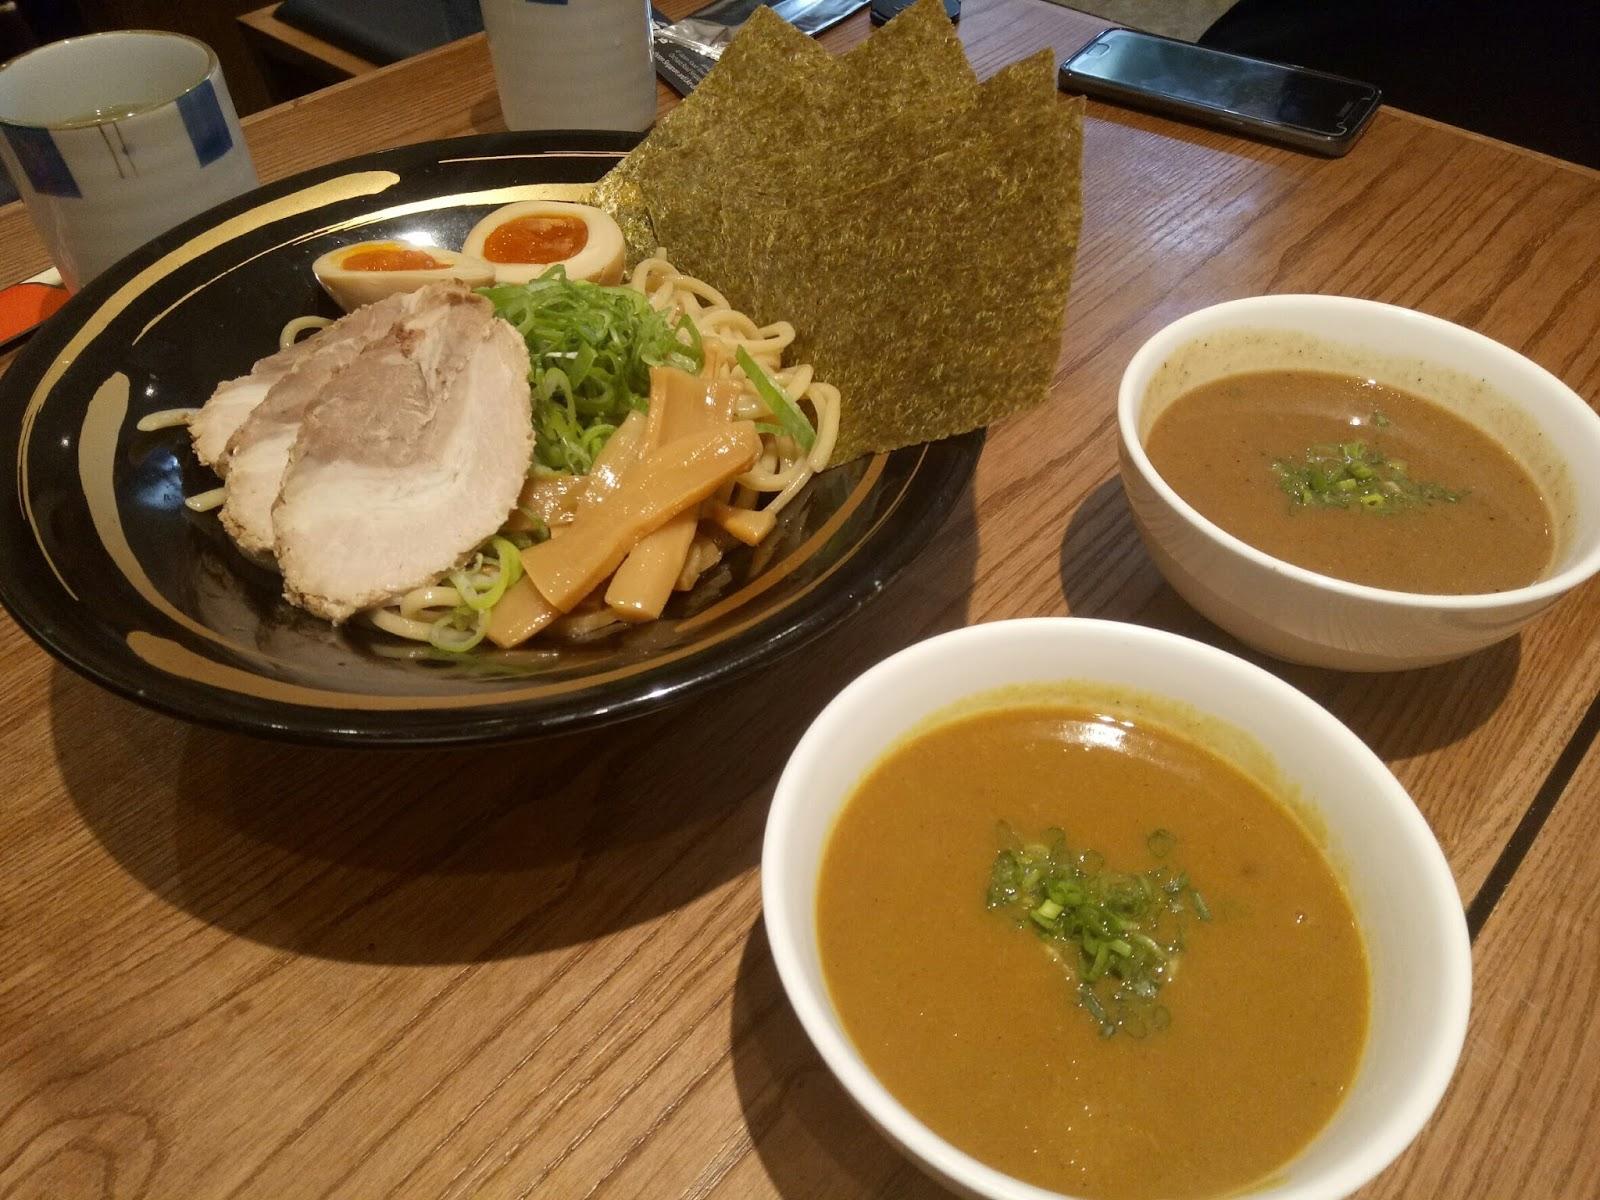 Luck Japanese Restaurant Brighton Le Sands